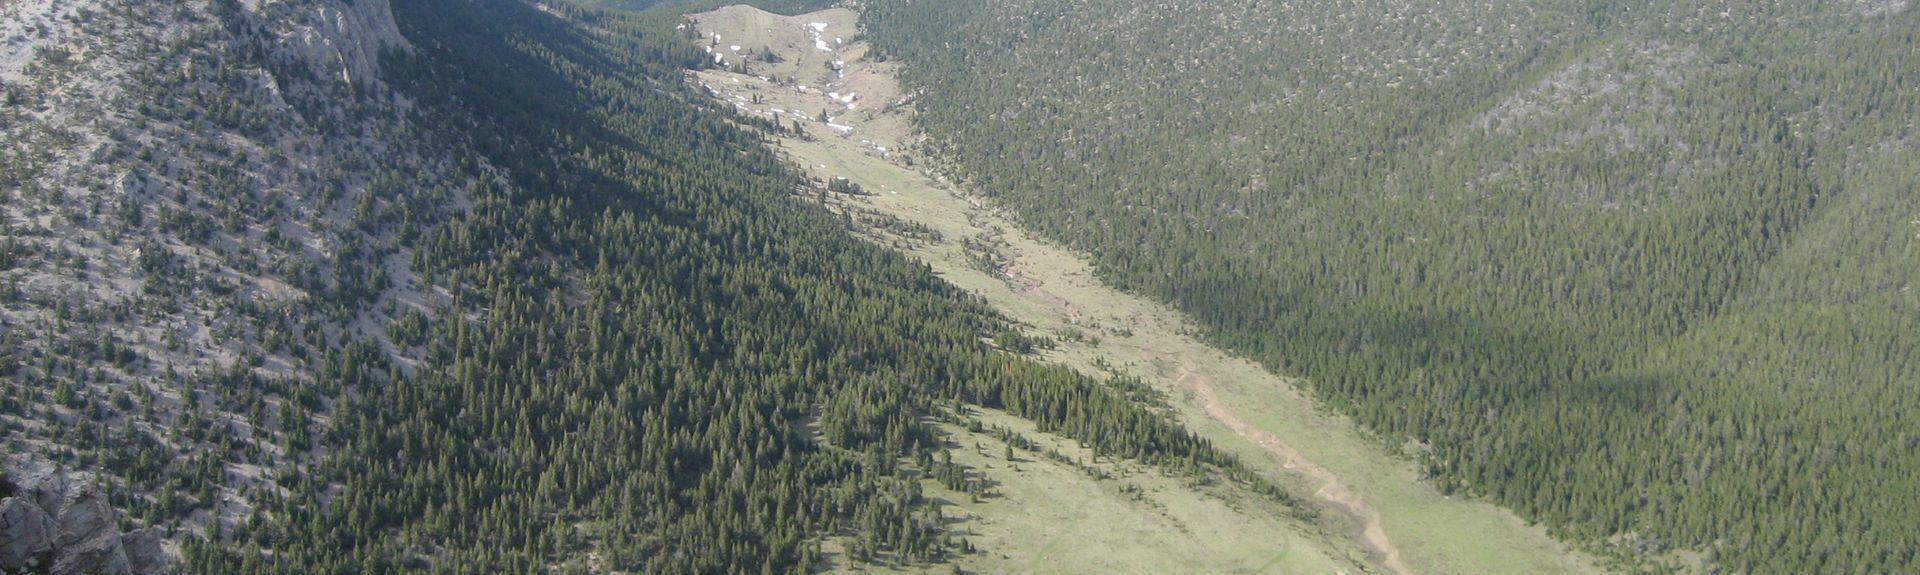 Choteau, Montana, United States of America